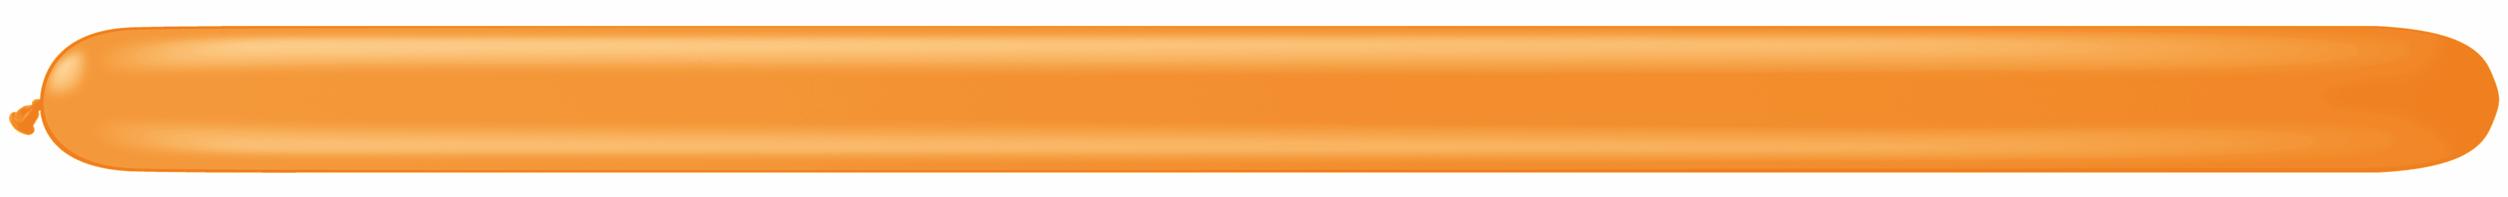 350Q Latex Balloons (100 Count) Orange